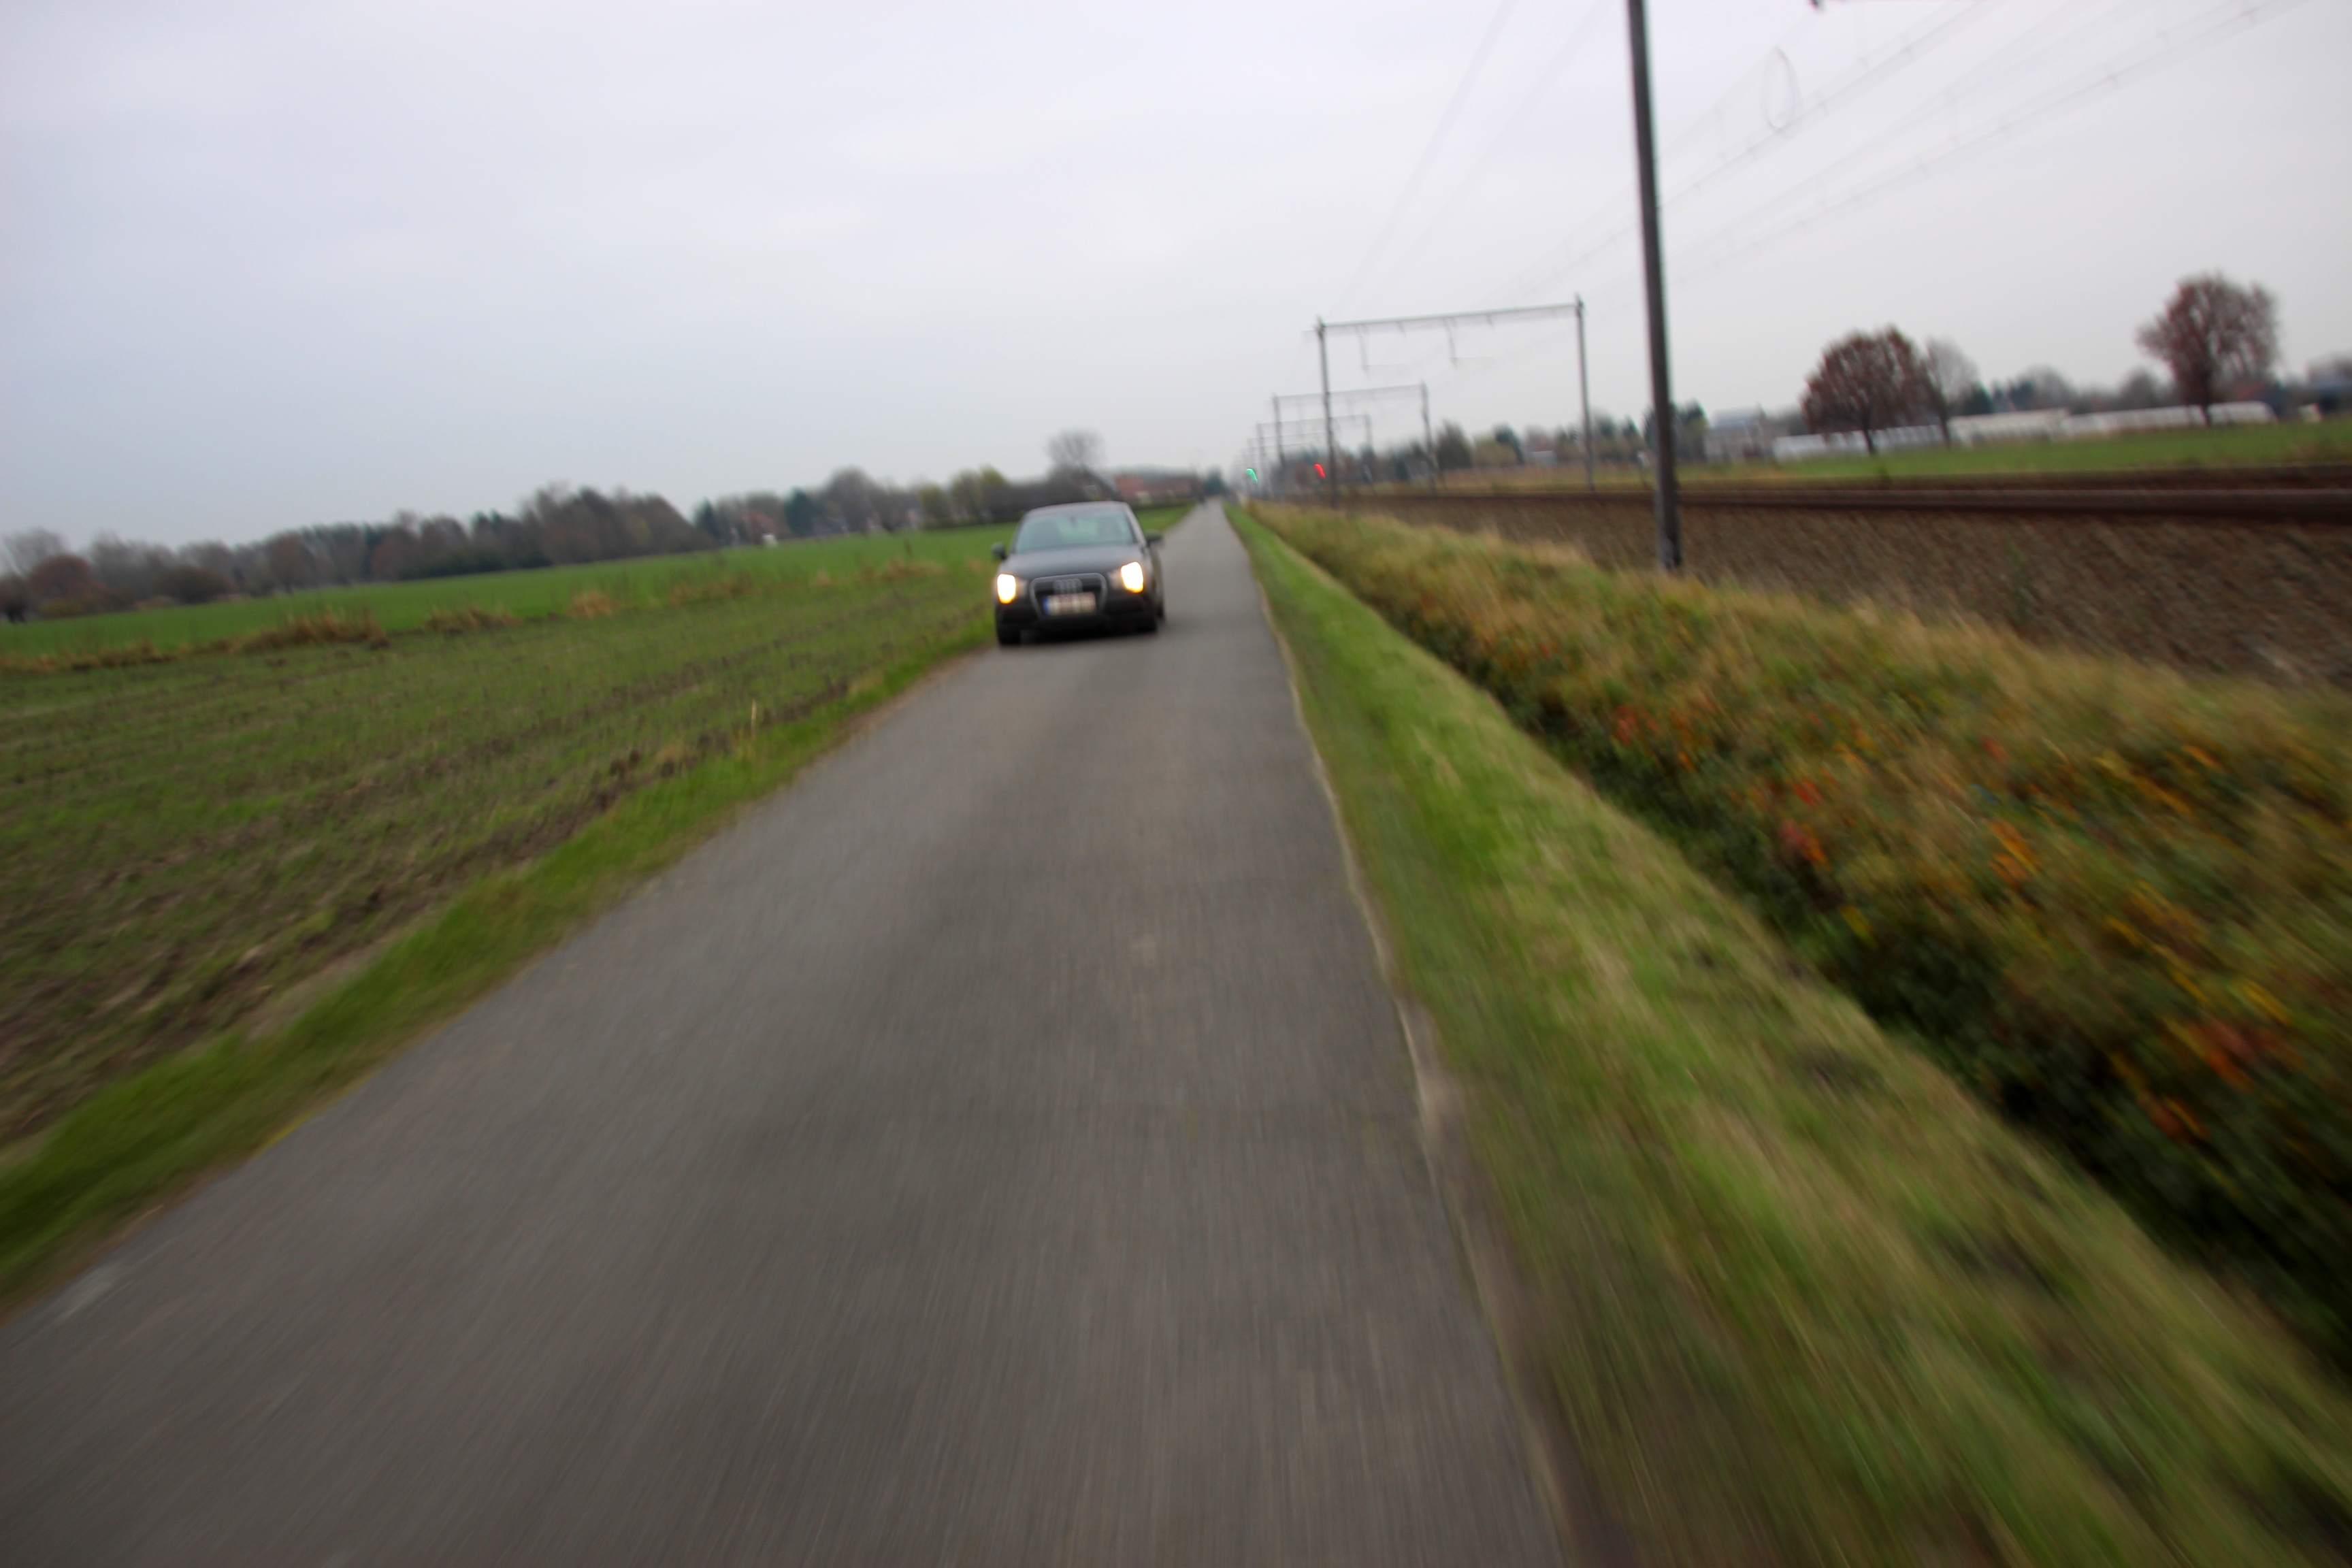 26nov16, Langs de spoorweg, Sint-Martens-Latem